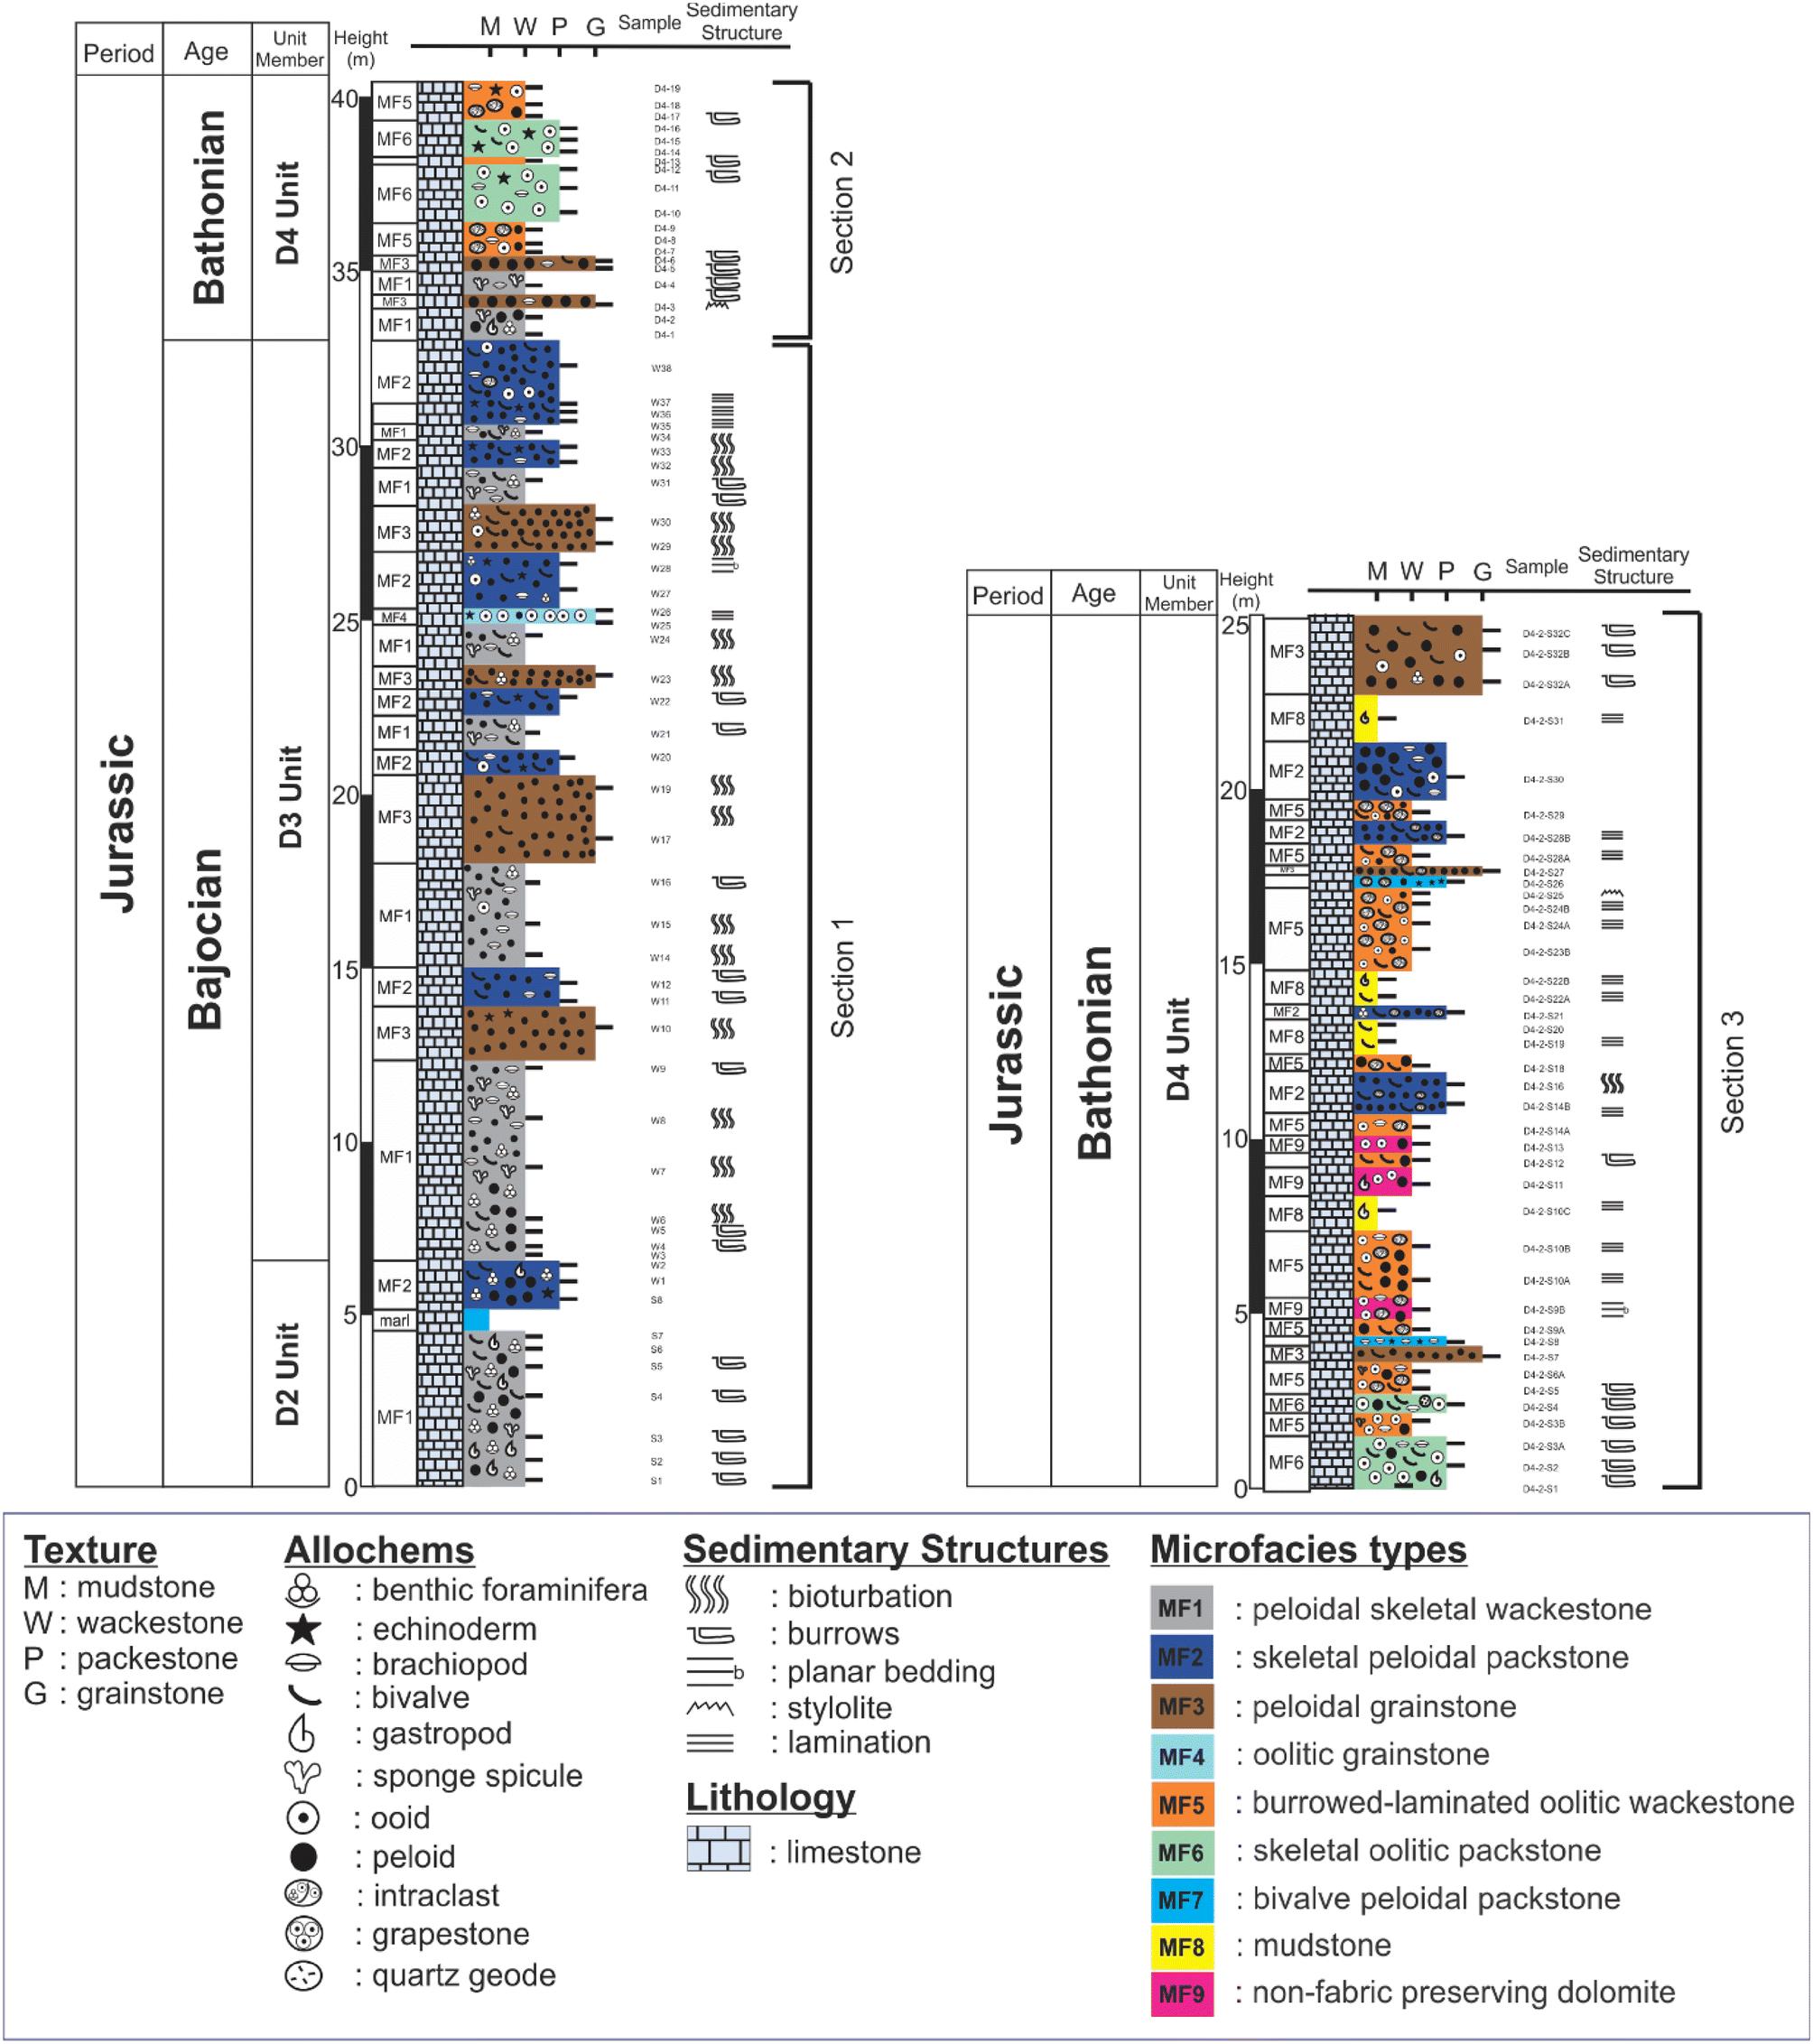 Microfacies, biofacies, and depositional environments of the